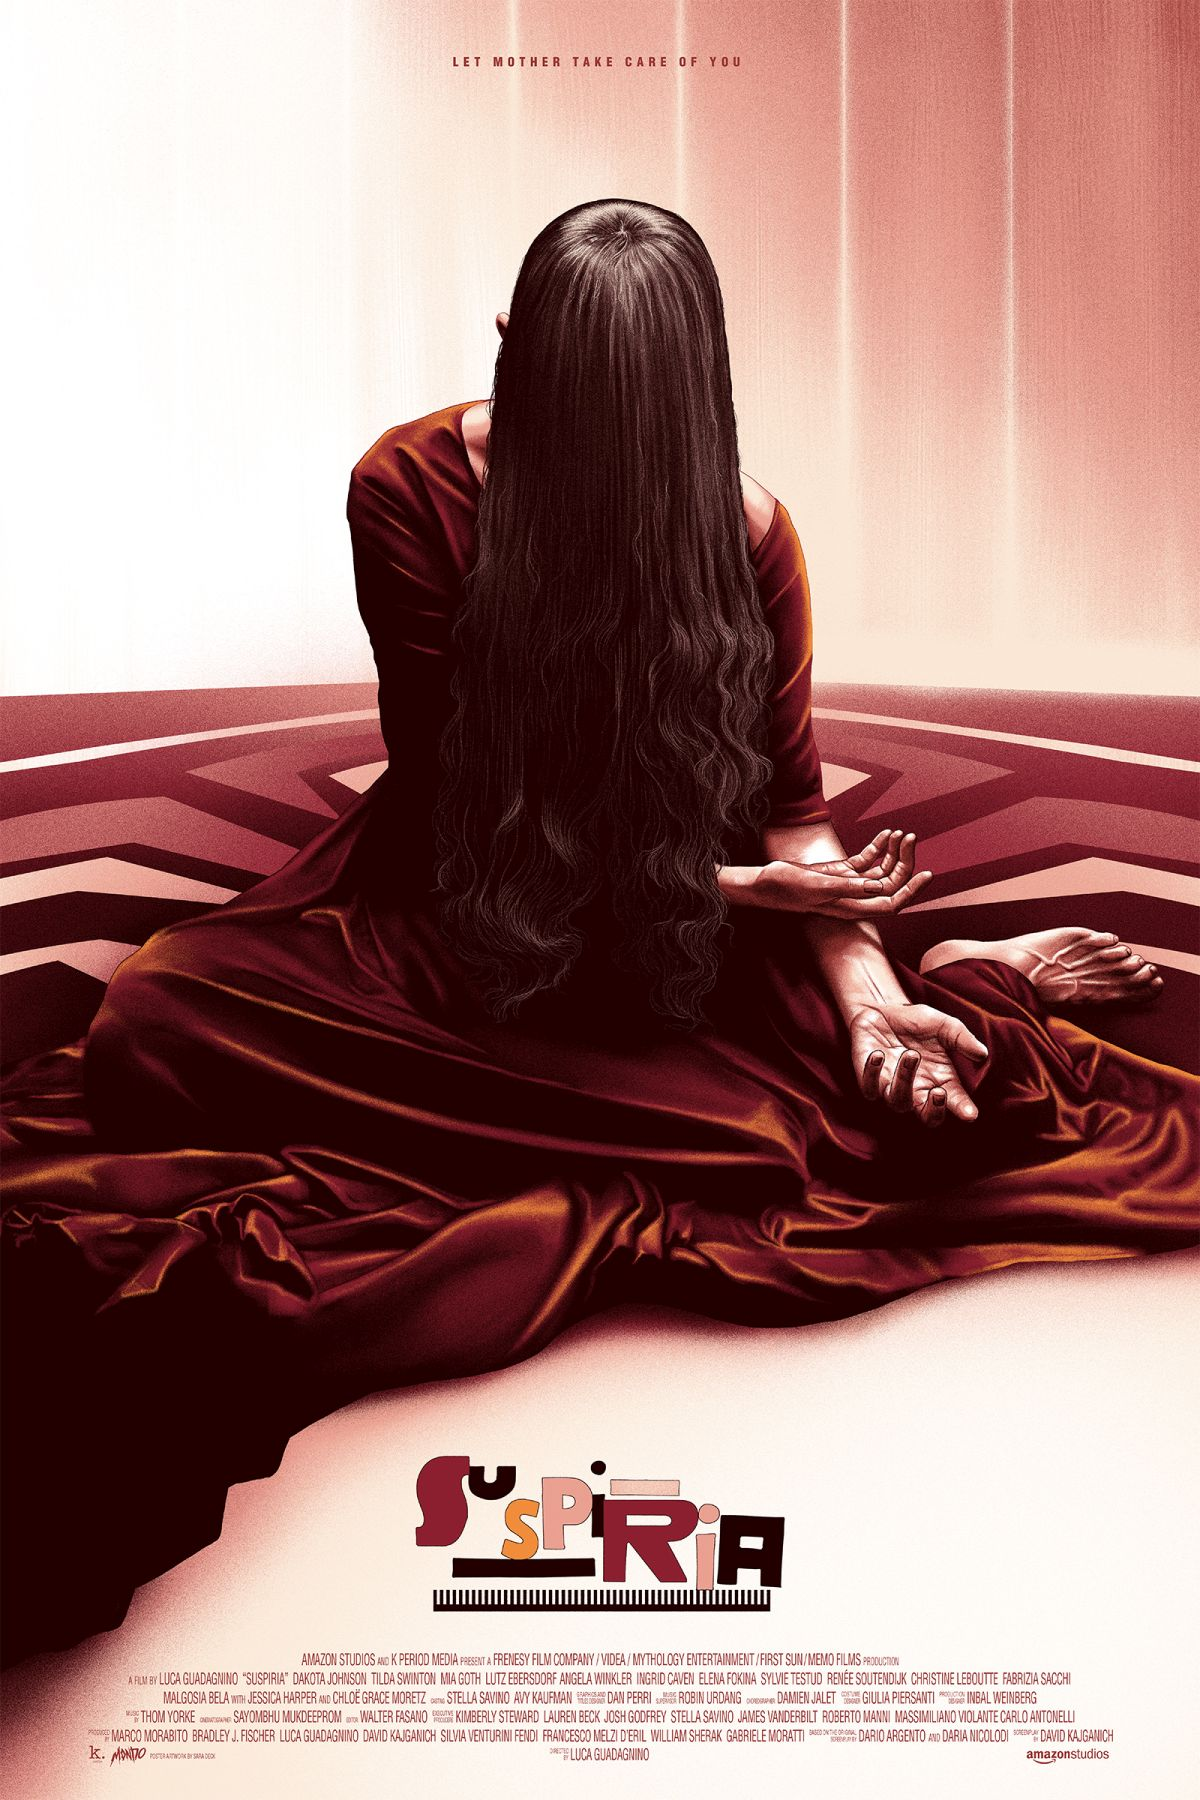 Plakat promujący film Suspiria